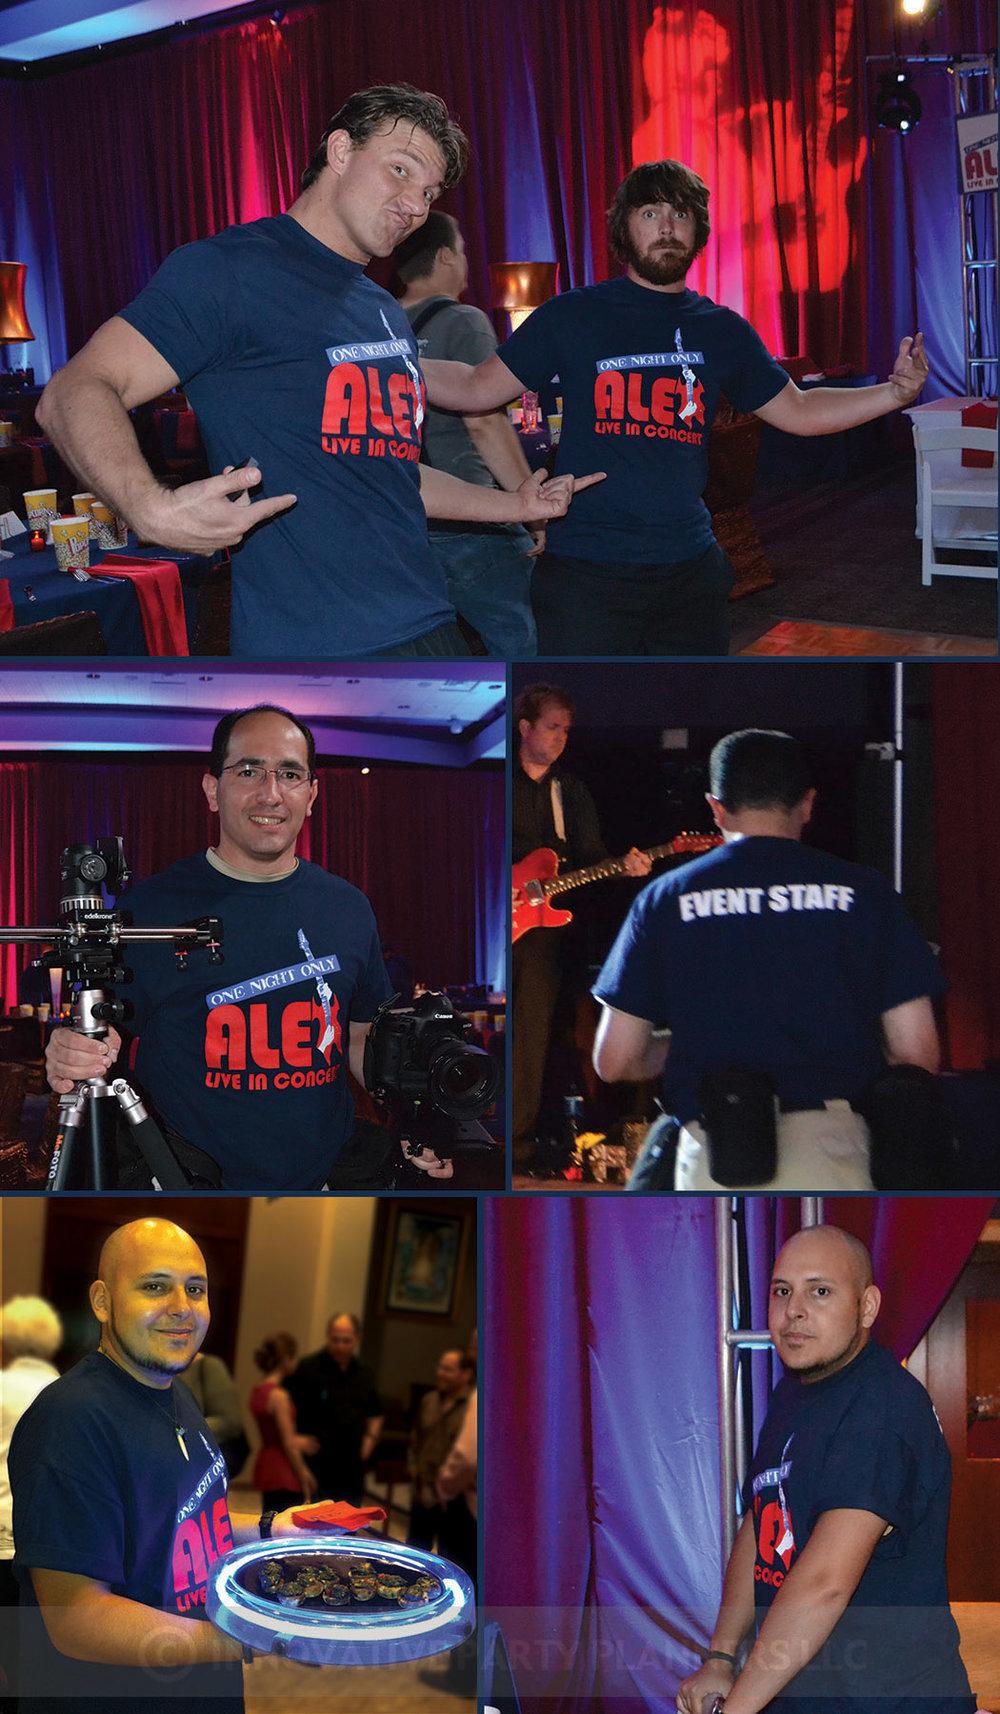 EventStaff_T_Shirts.jpg